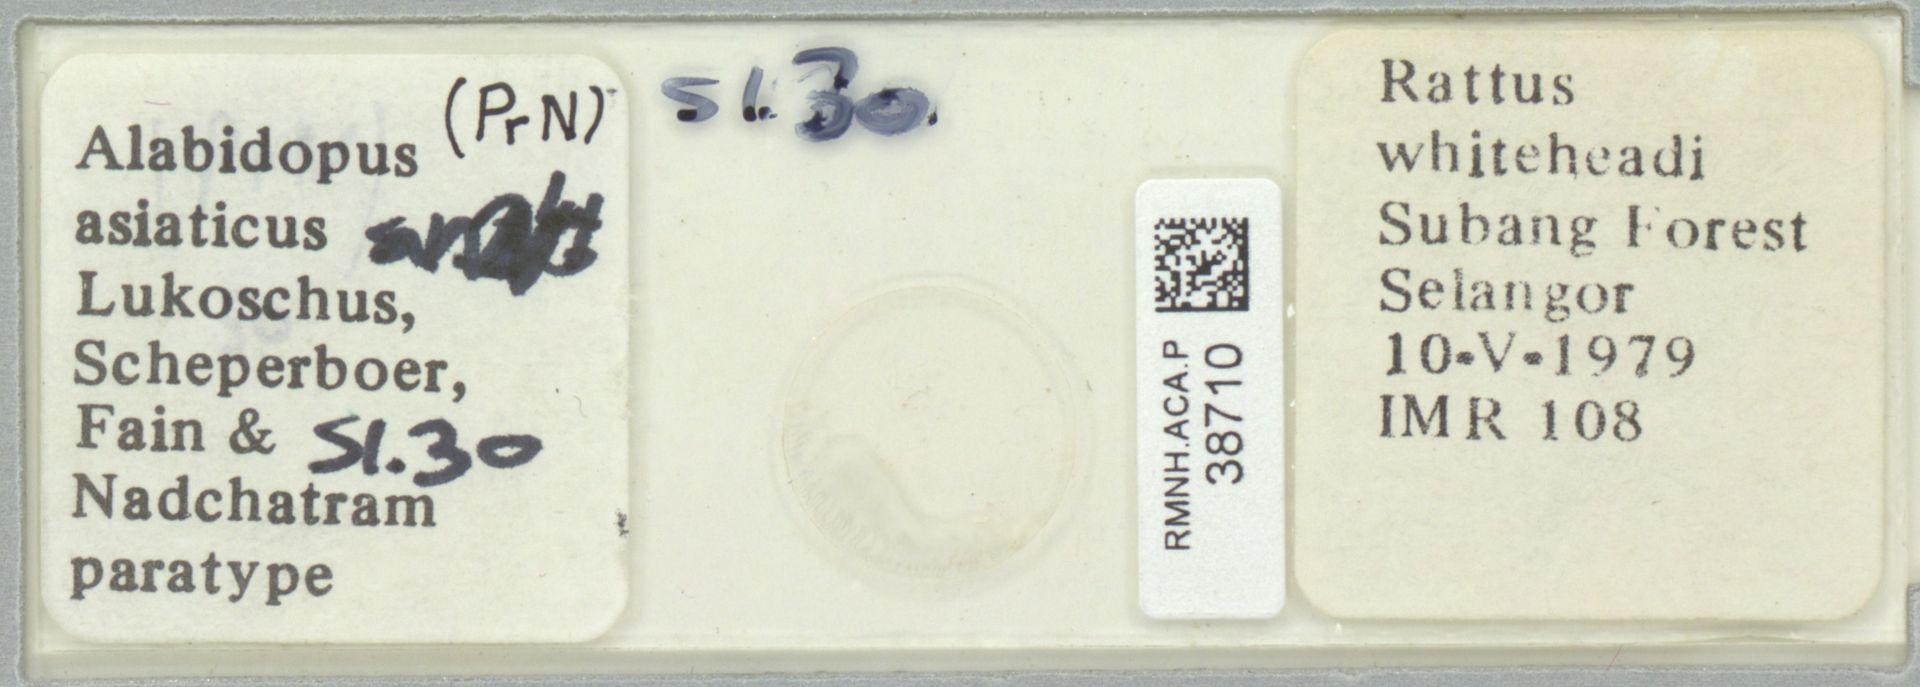 RMNH.ACA.P.38710   Alabidopus asiaticus Lukoschus, Scheperboer, Fain & Nadchatram